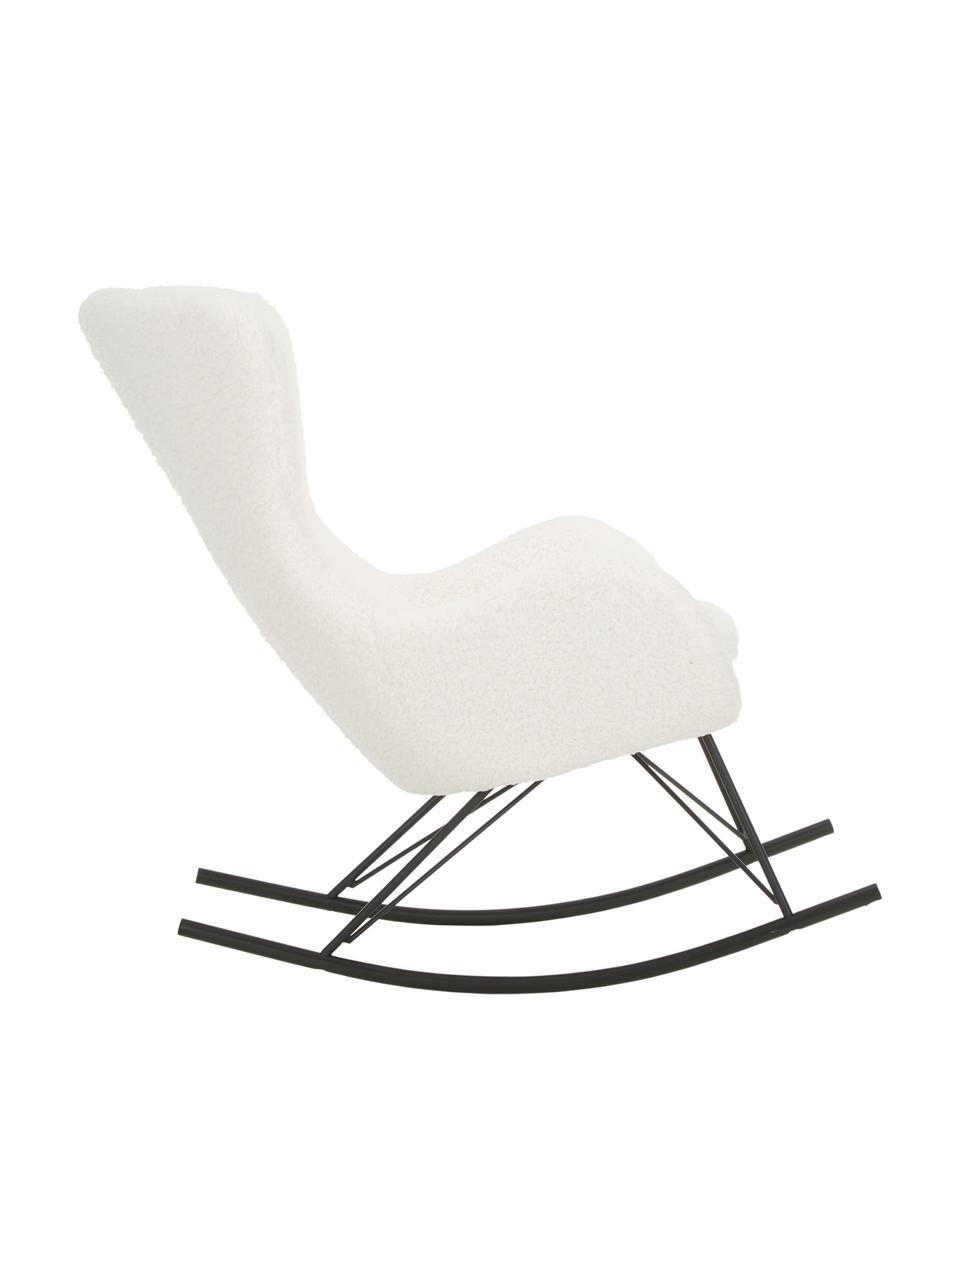 Teddy schommelstoel Wing in crèmewit, Bekleding: polyester (teddyvacht), Frame: gepoedercoat metaal, Geweven stof crèmewit, B 66 x D 102 cm